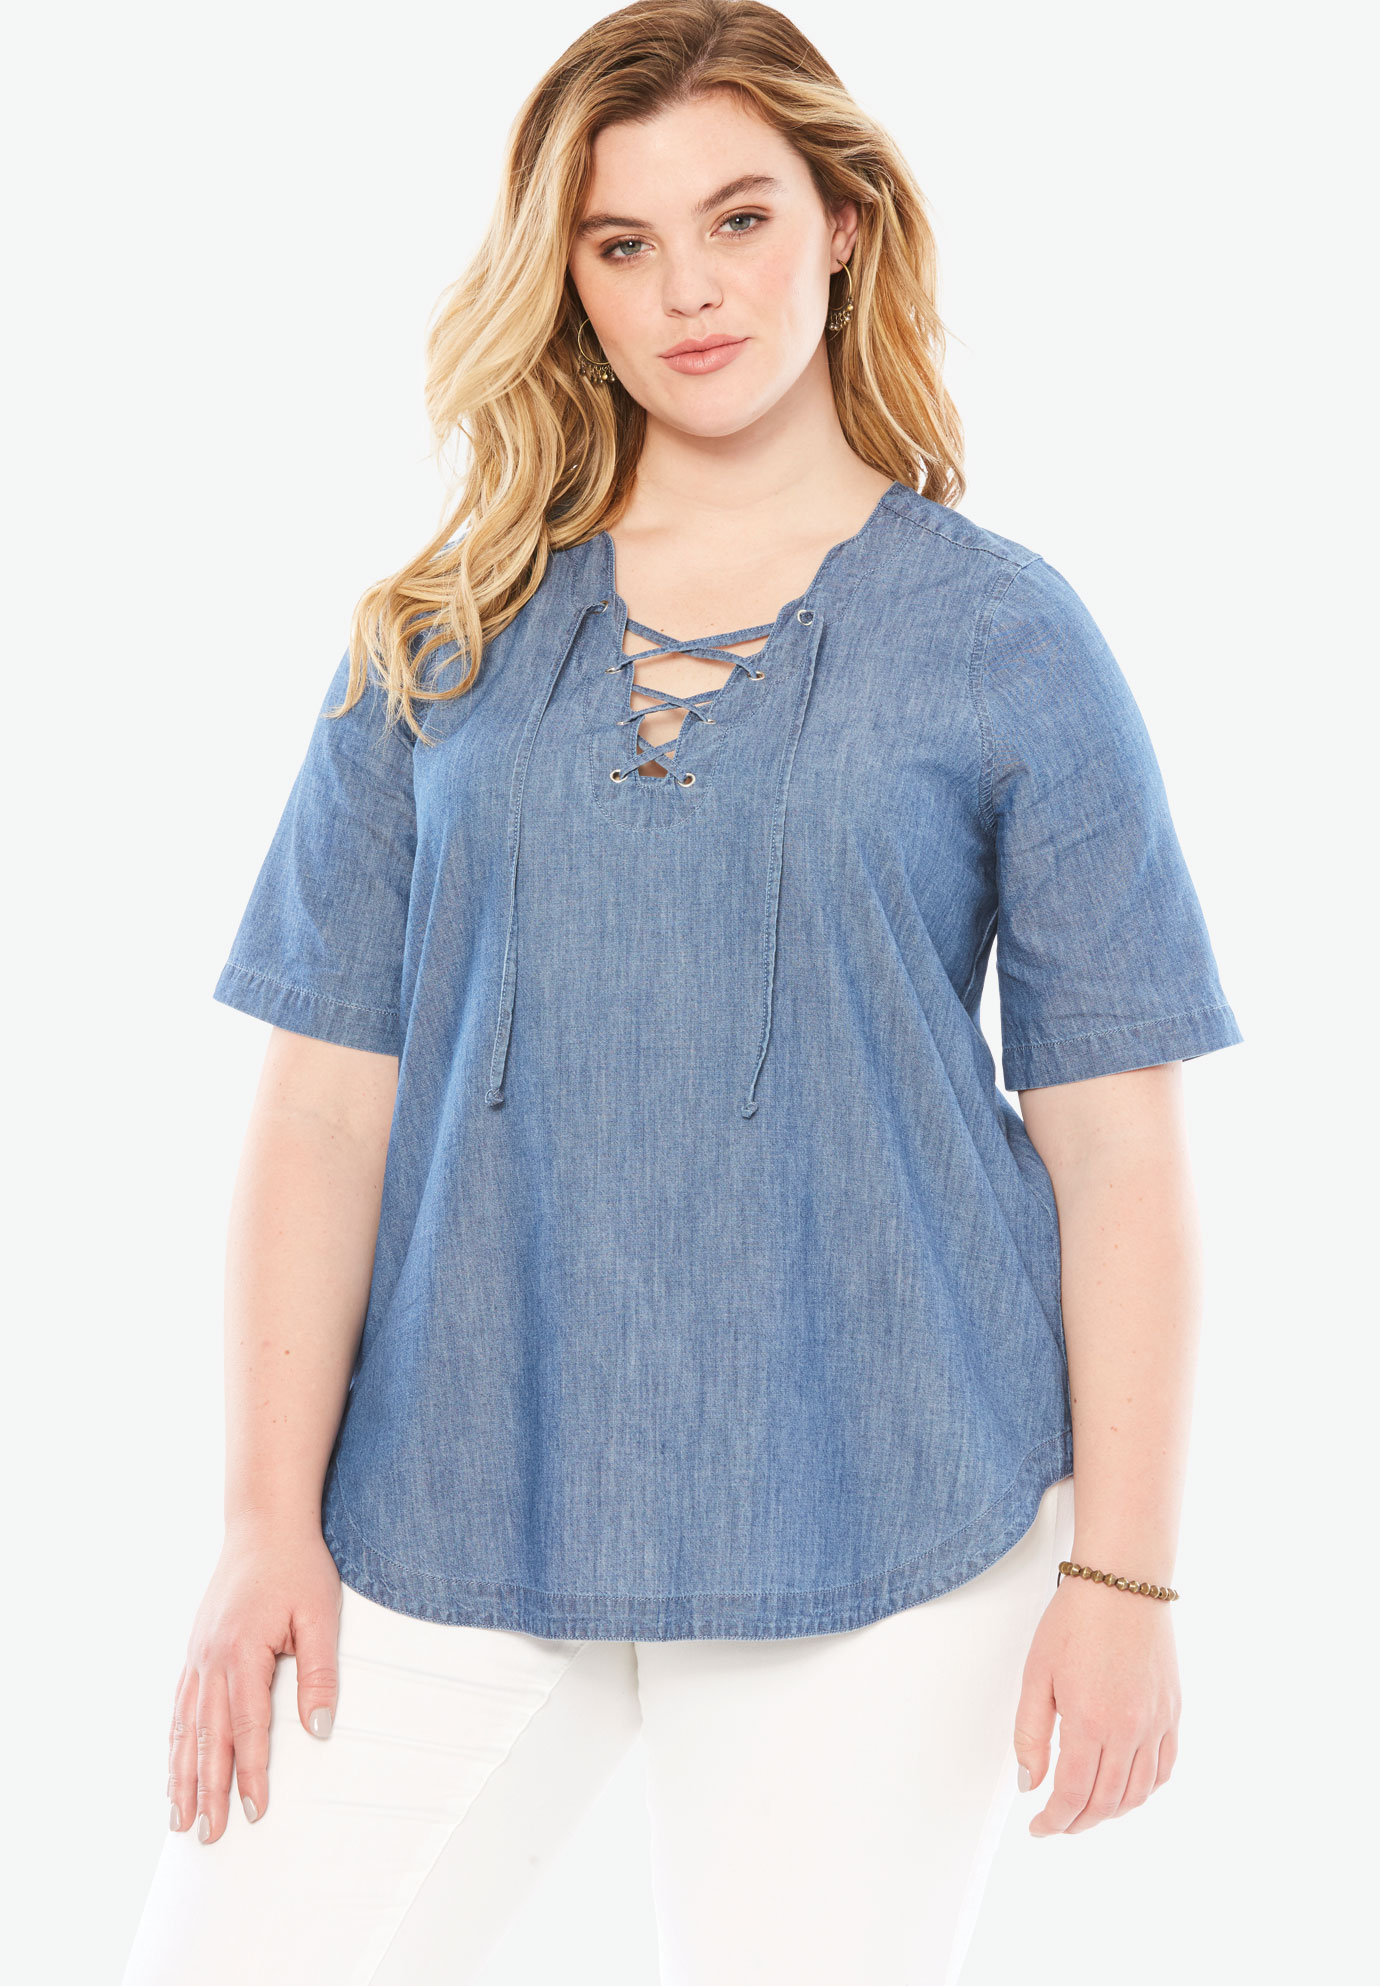 199086b14b3 Lace Up Denim Shirt by Denim 24/7| Plus Size Shirts & Blouses | Full ...